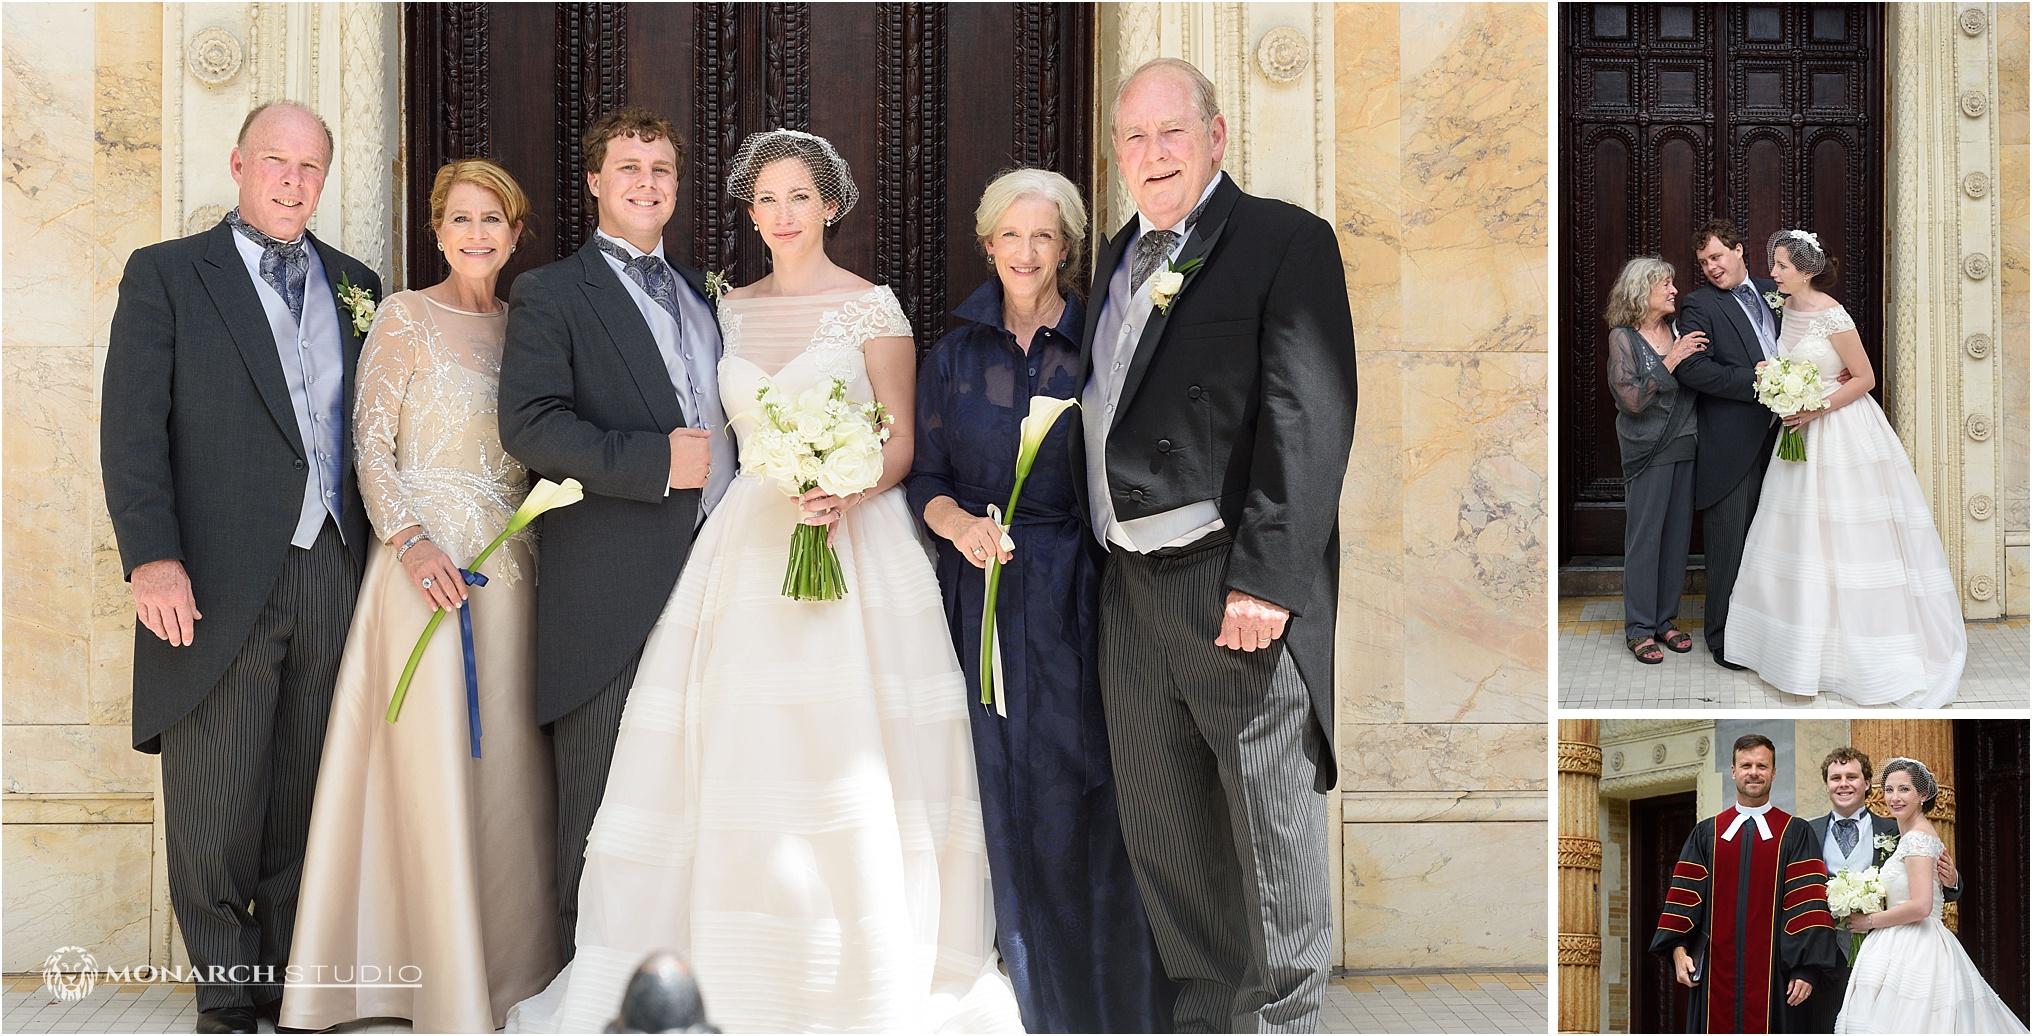 065-st-augustine-wedding-photographer-.jpg